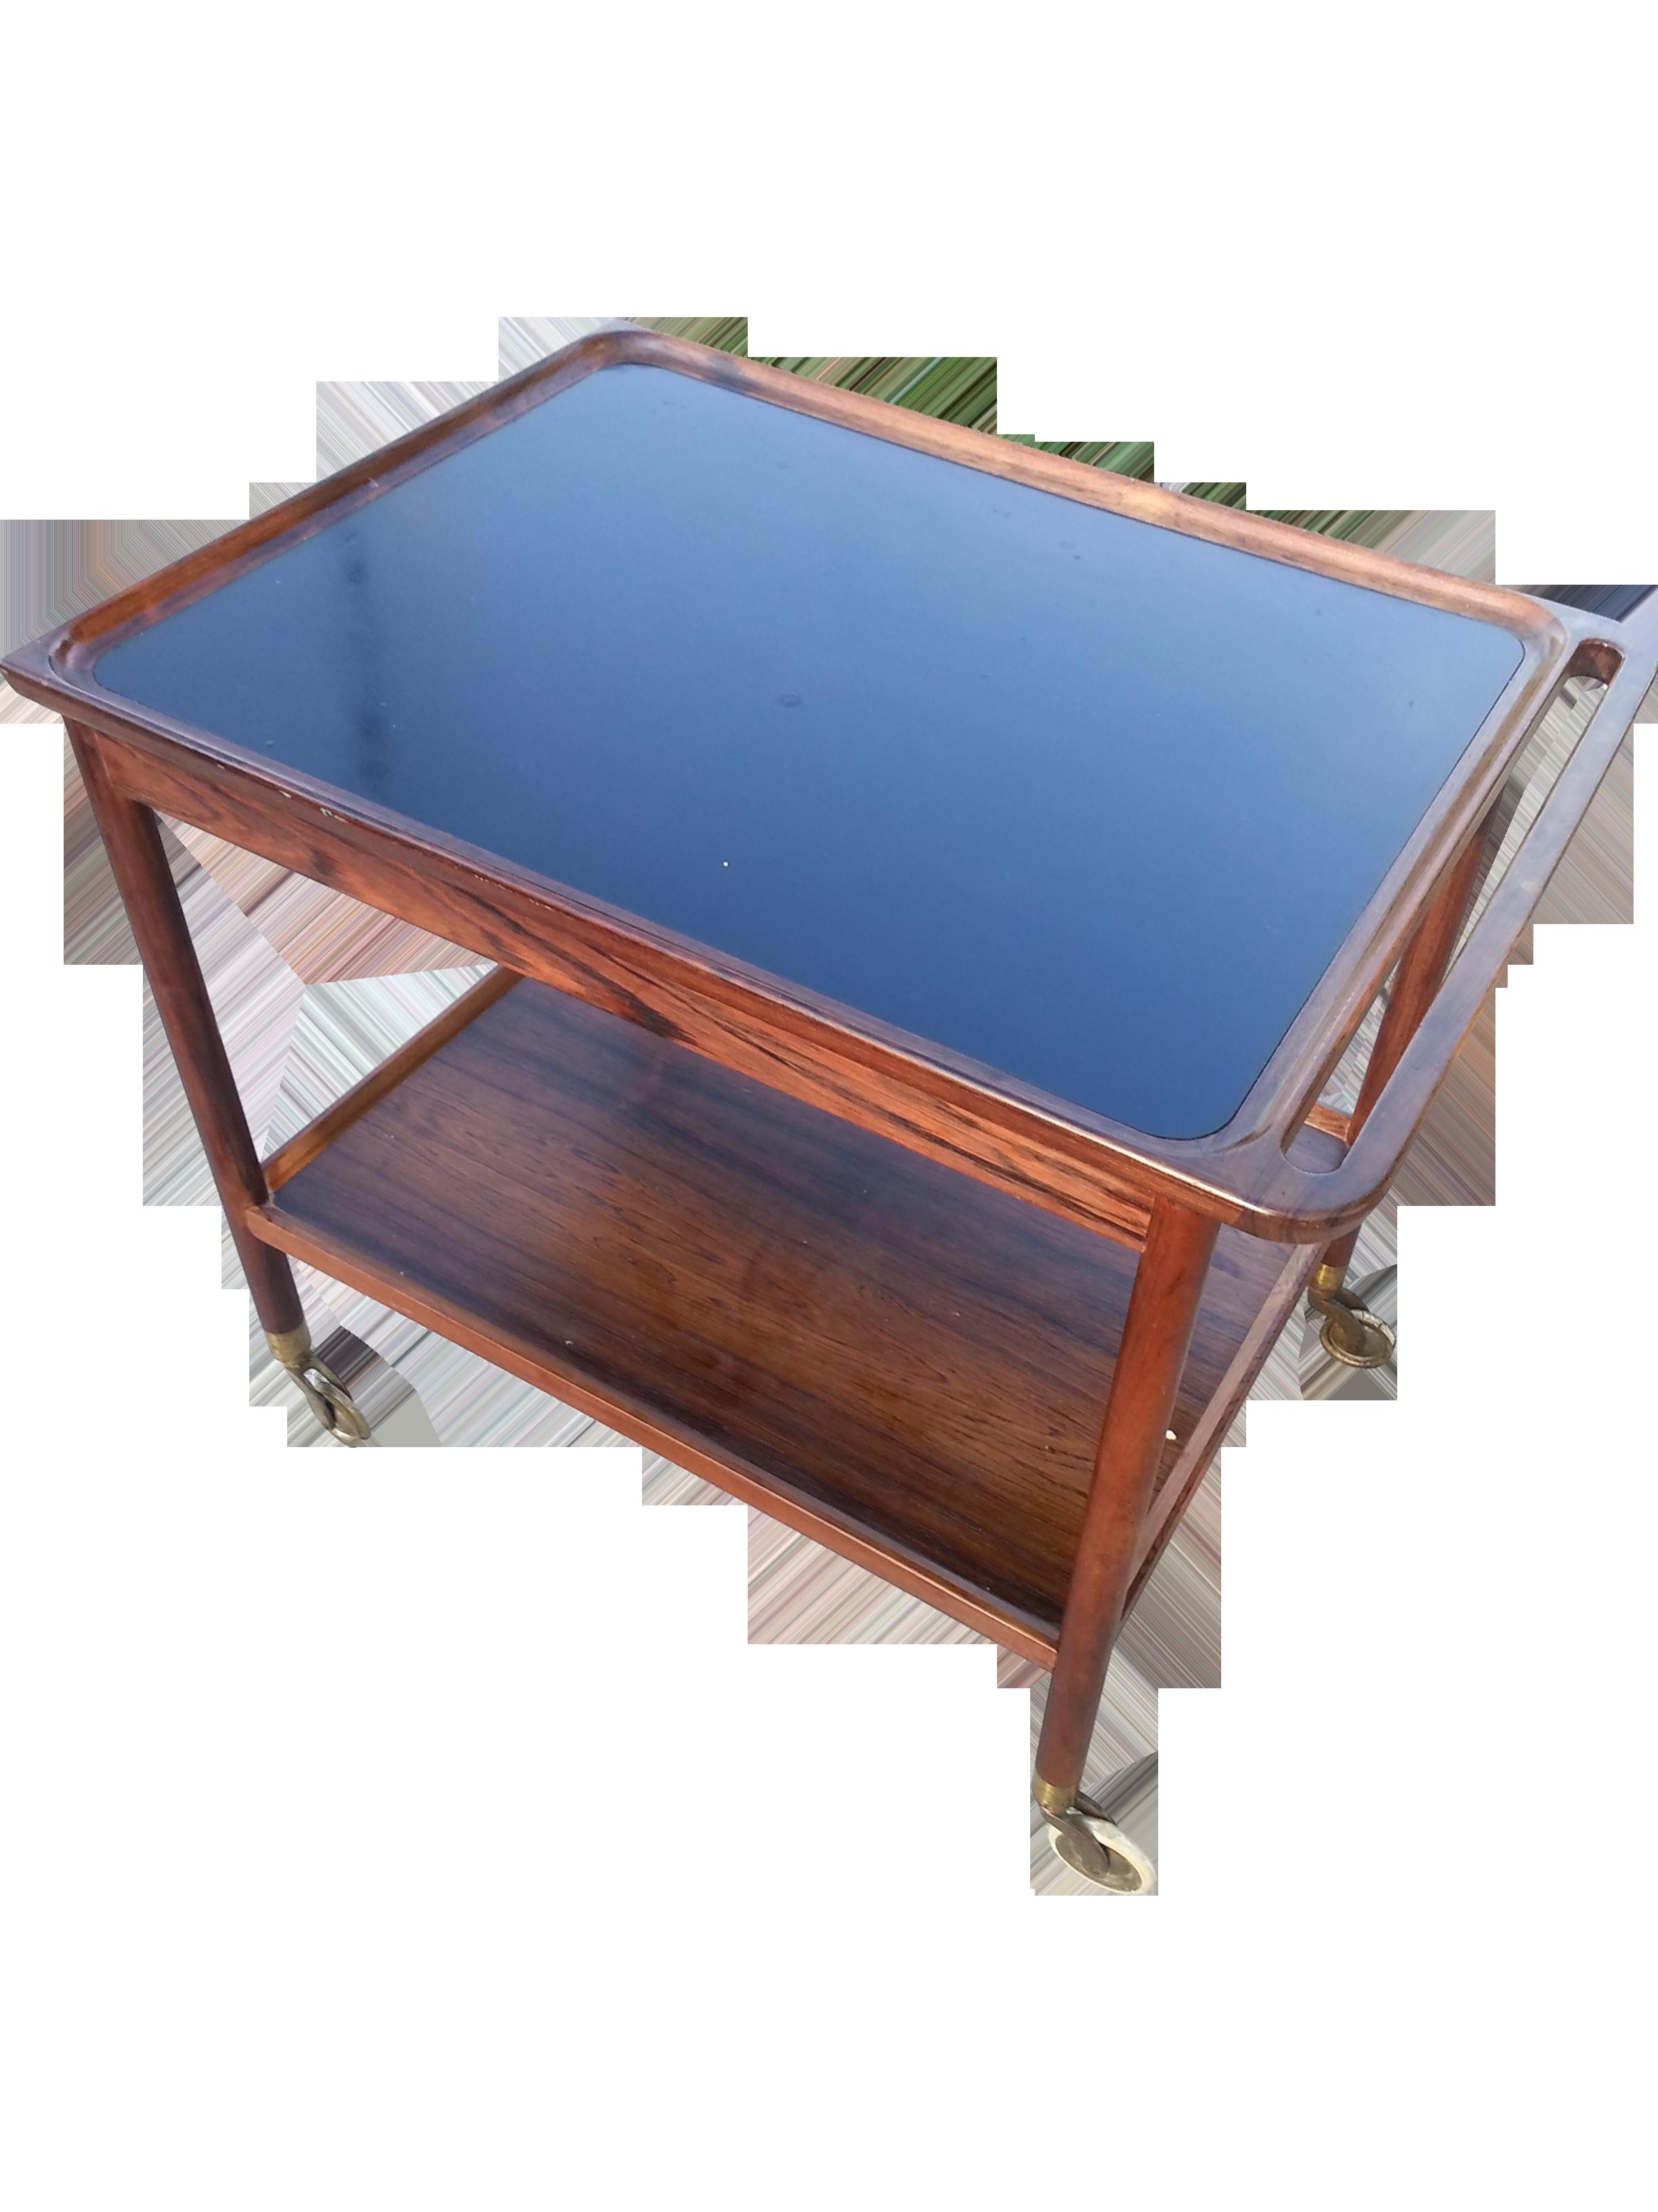 danish modern mid century modern mahogany bar cart designer ludvig pontpoppidan 1969 chairish. Black Bedroom Furniture Sets. Home Design Ideas